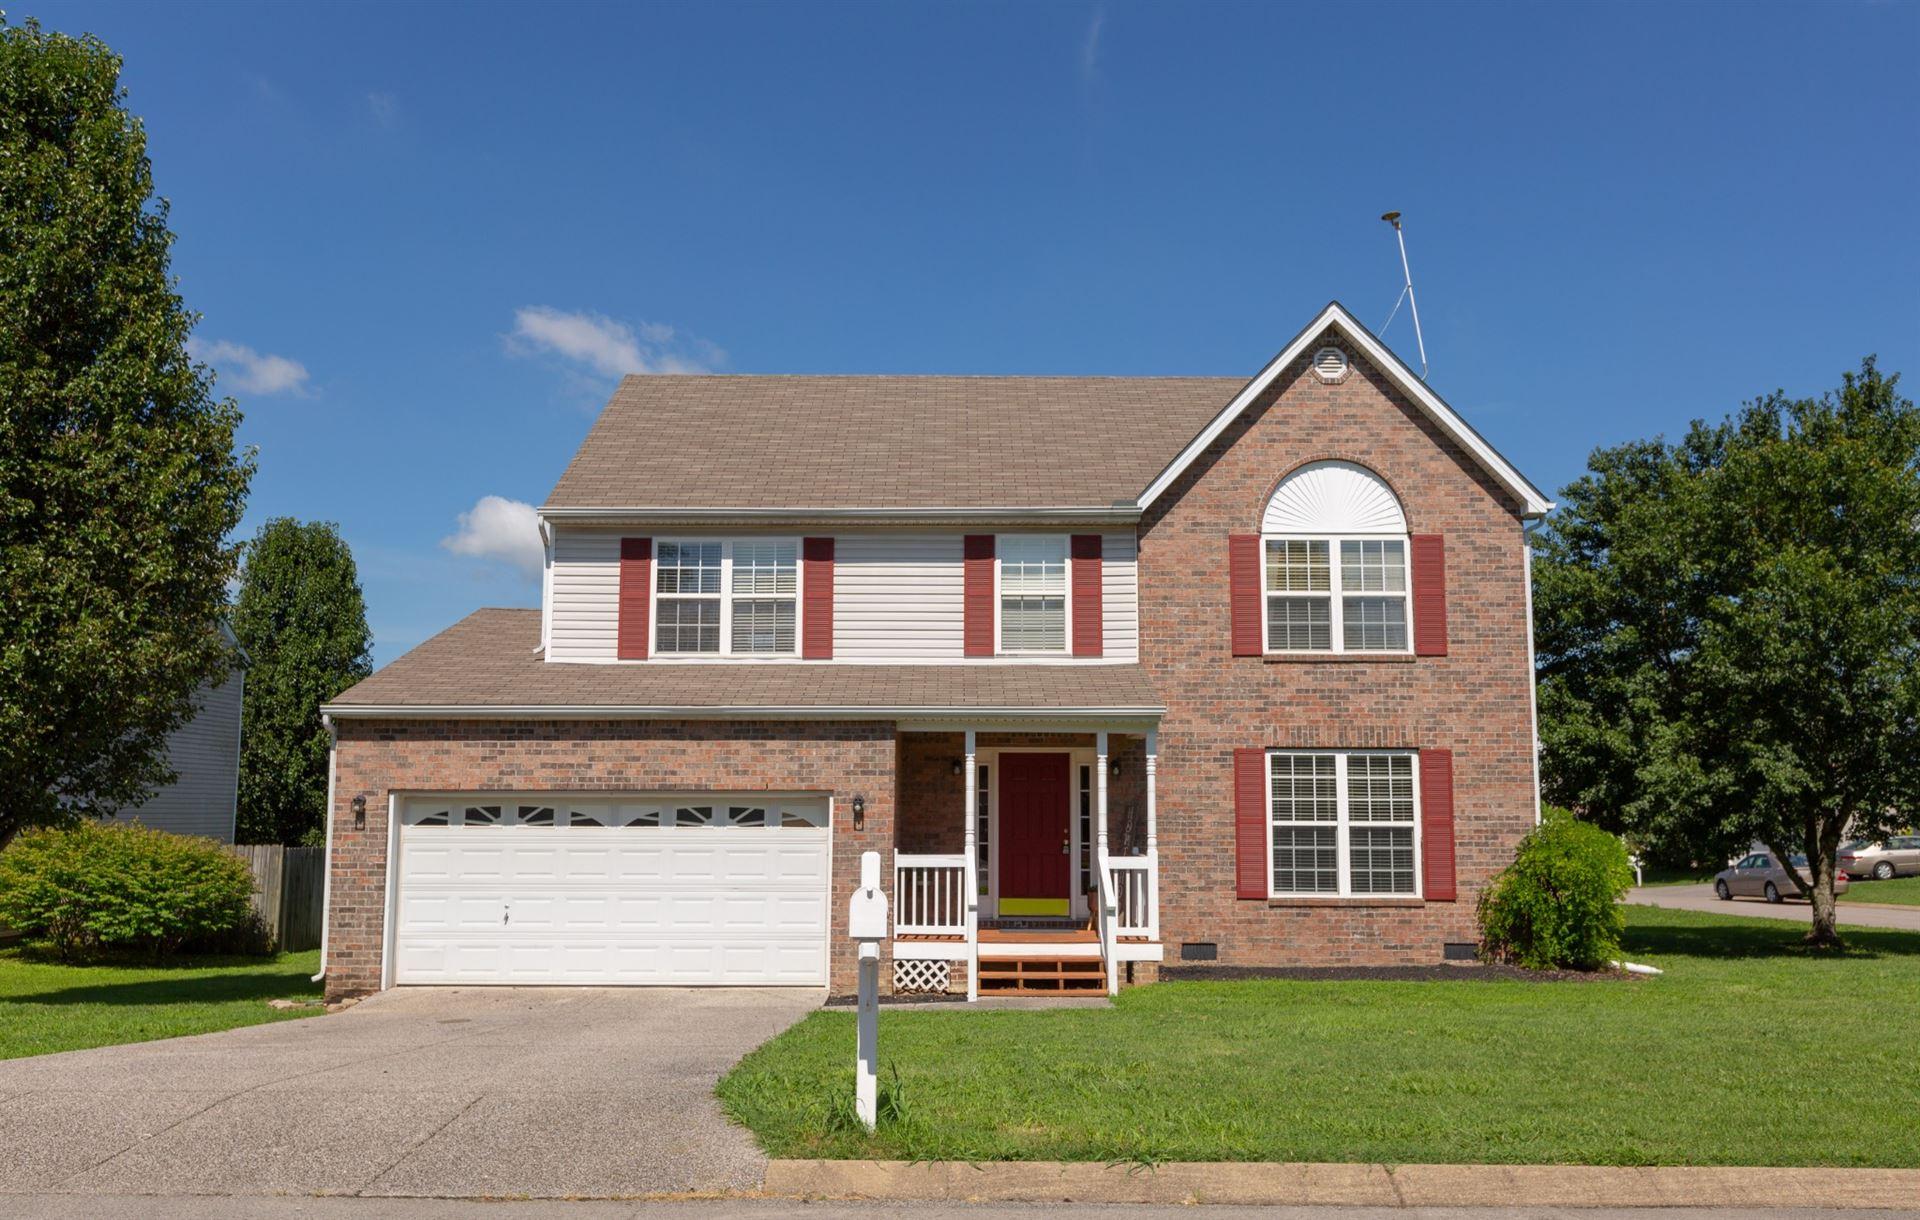 Photo of 1614 Harrison Way, Spring Hill, TN 37174 (MLS # 2169341)